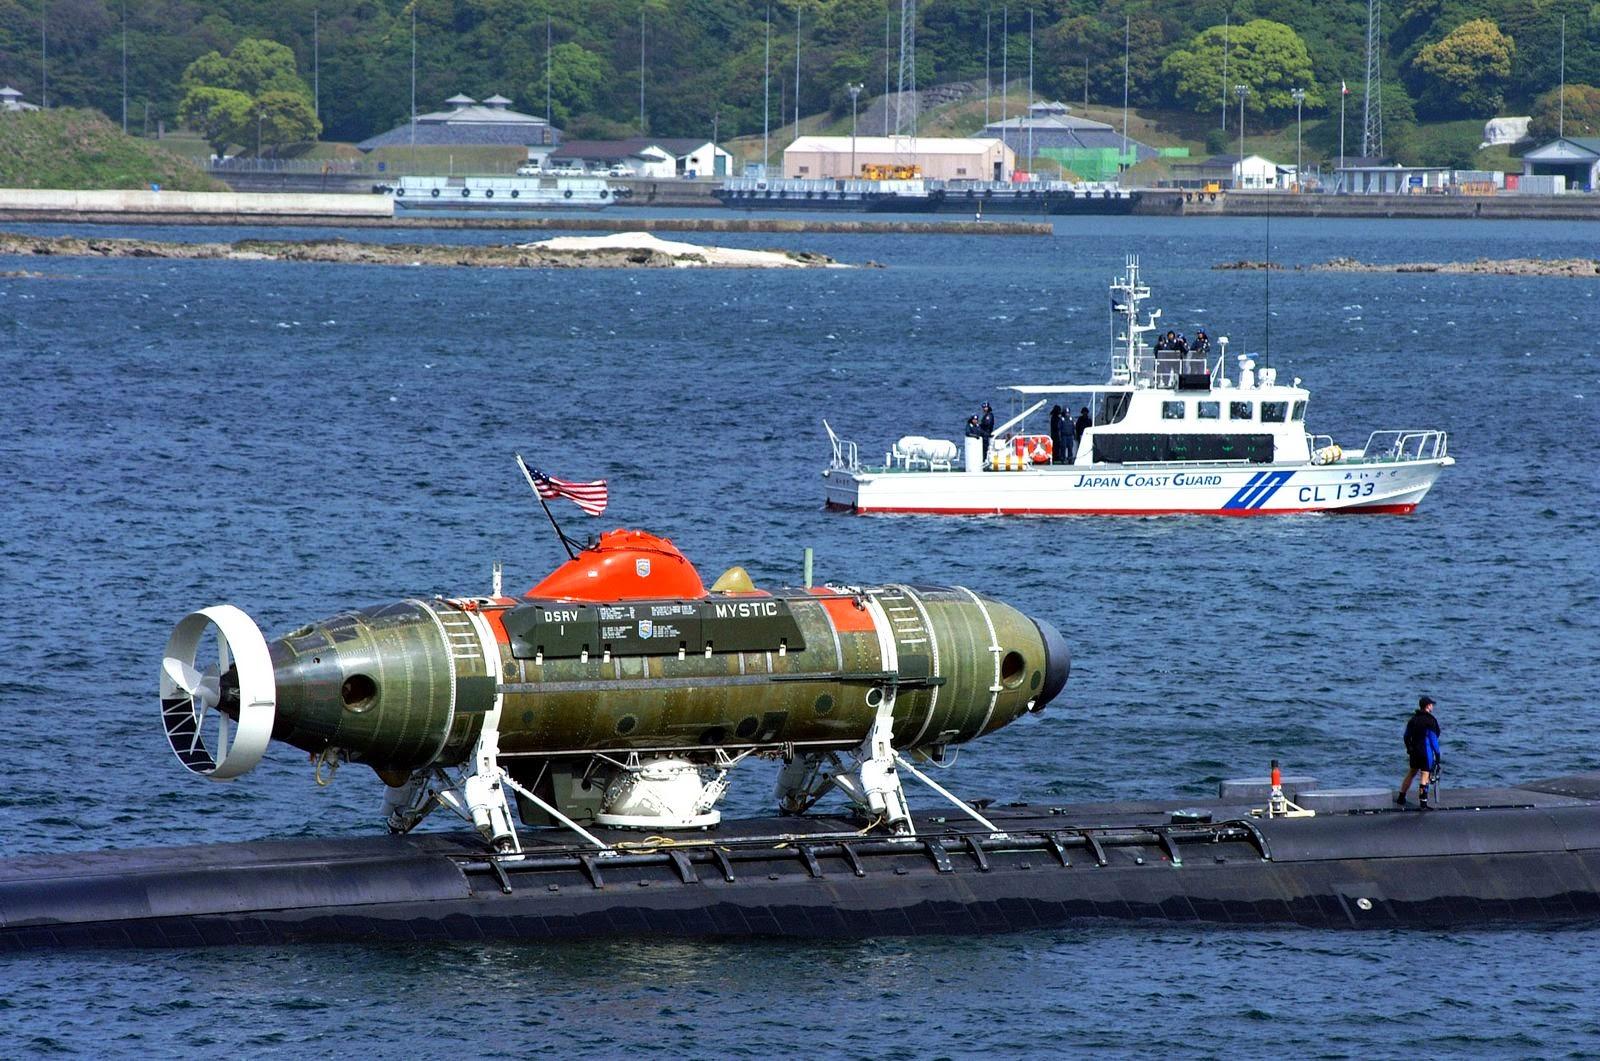 El Mystic acoplado sobre un submarino nodriza